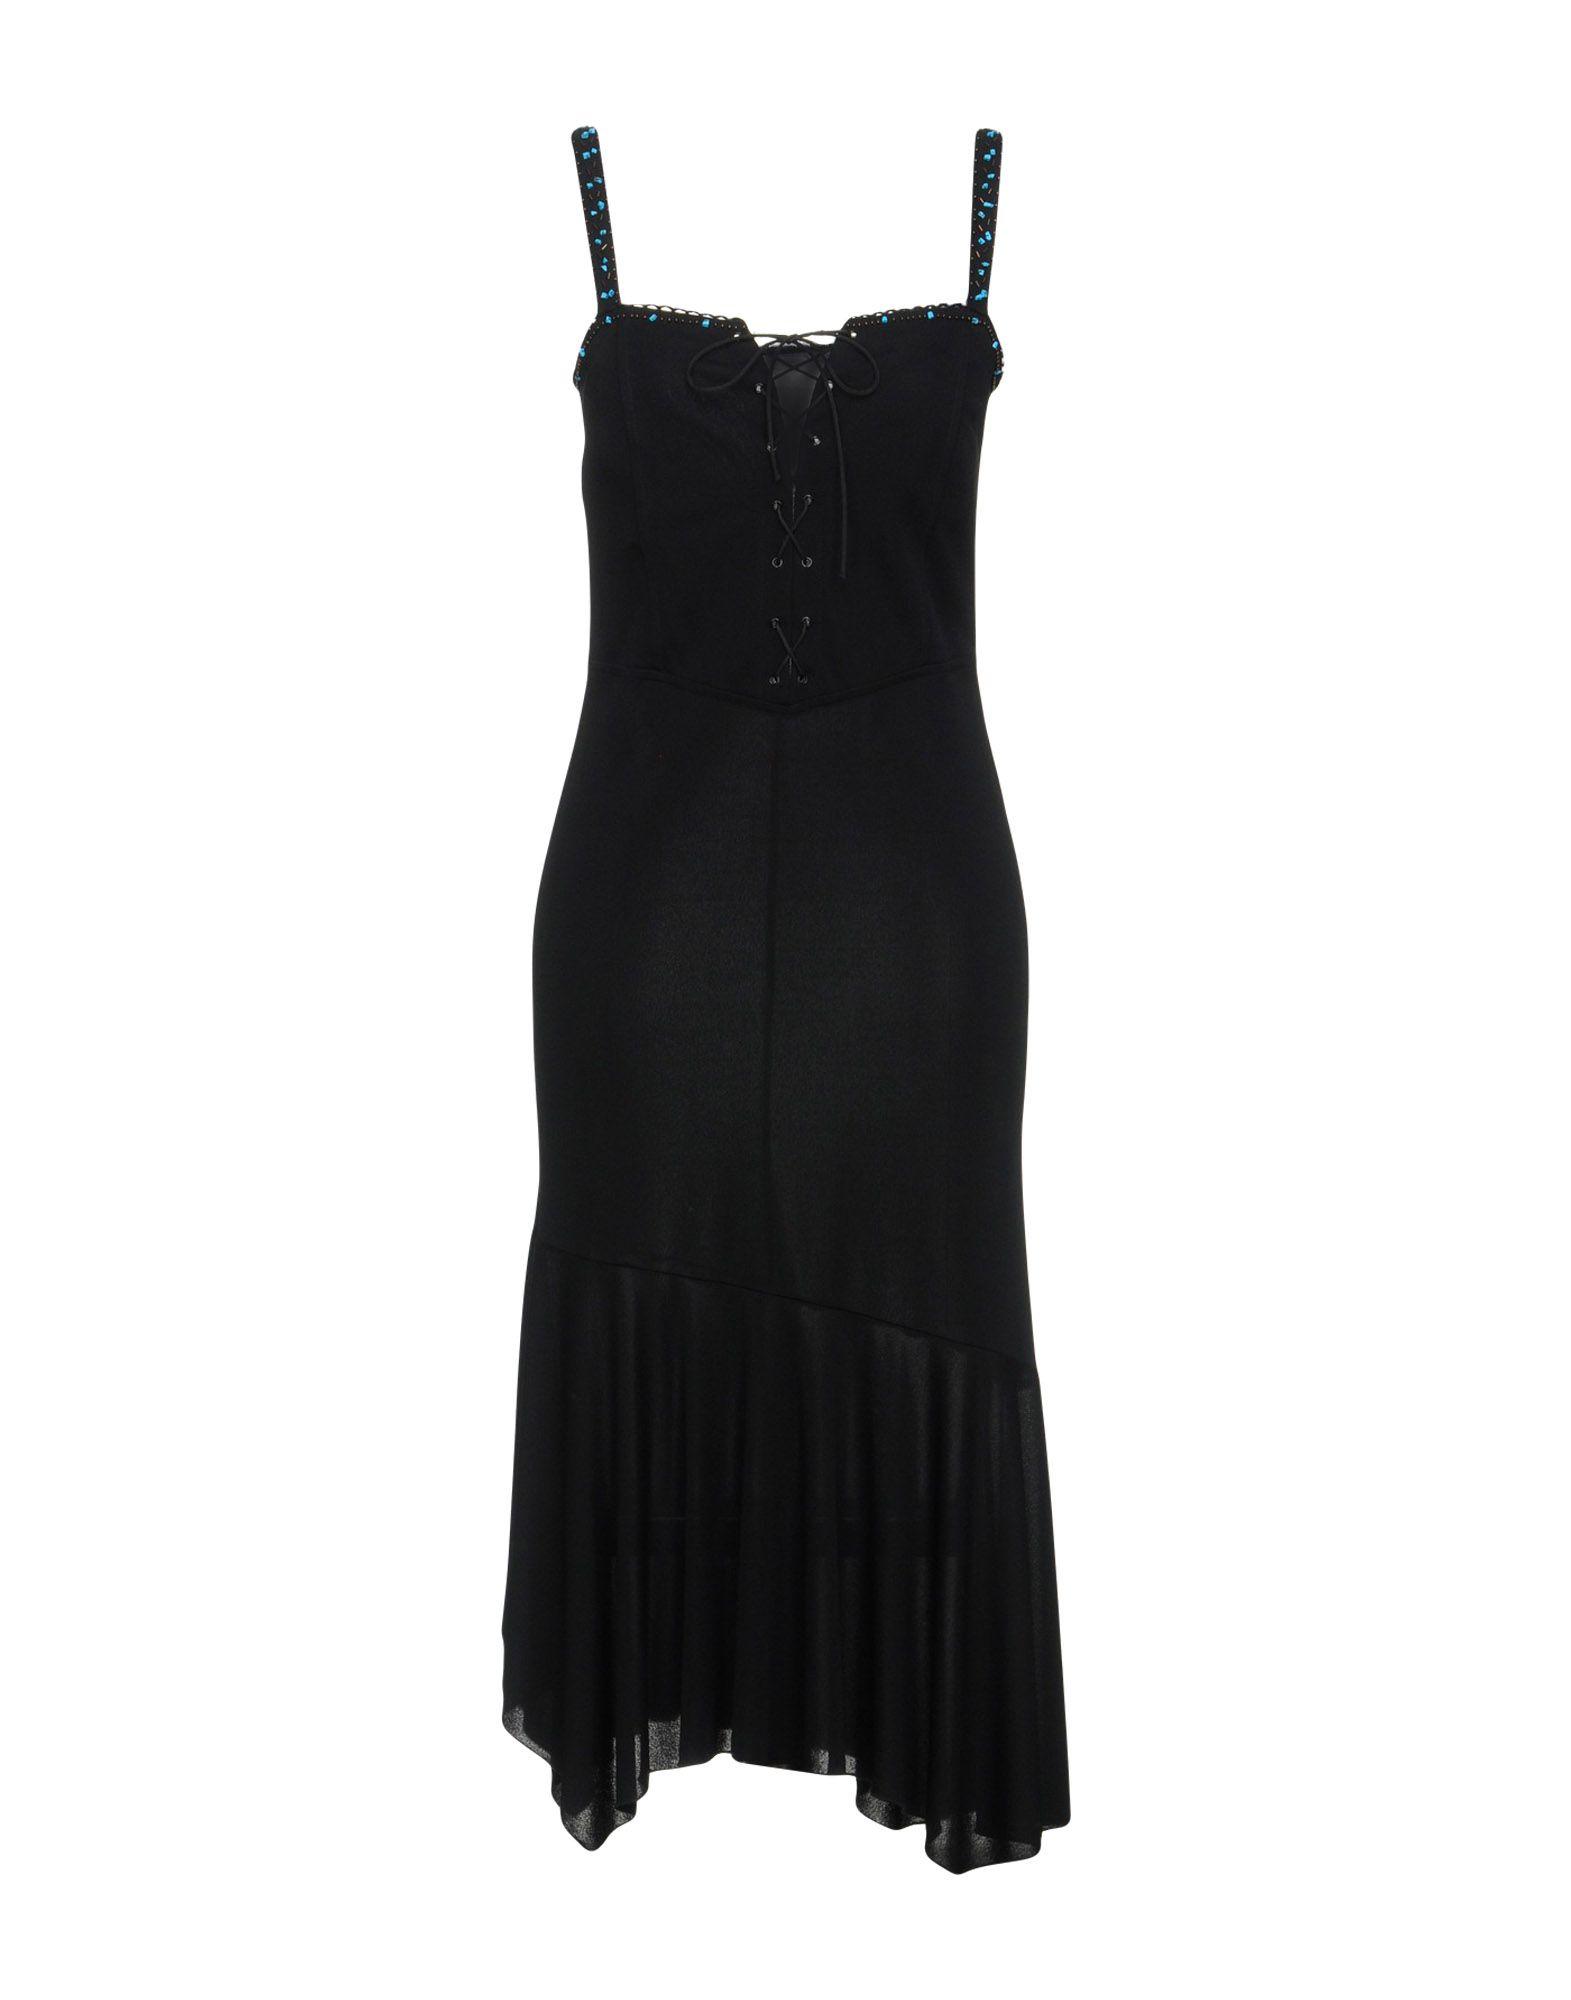 MARTINA ROVERSI Платье длиной 3/4 la martina gmp607xc007 07088